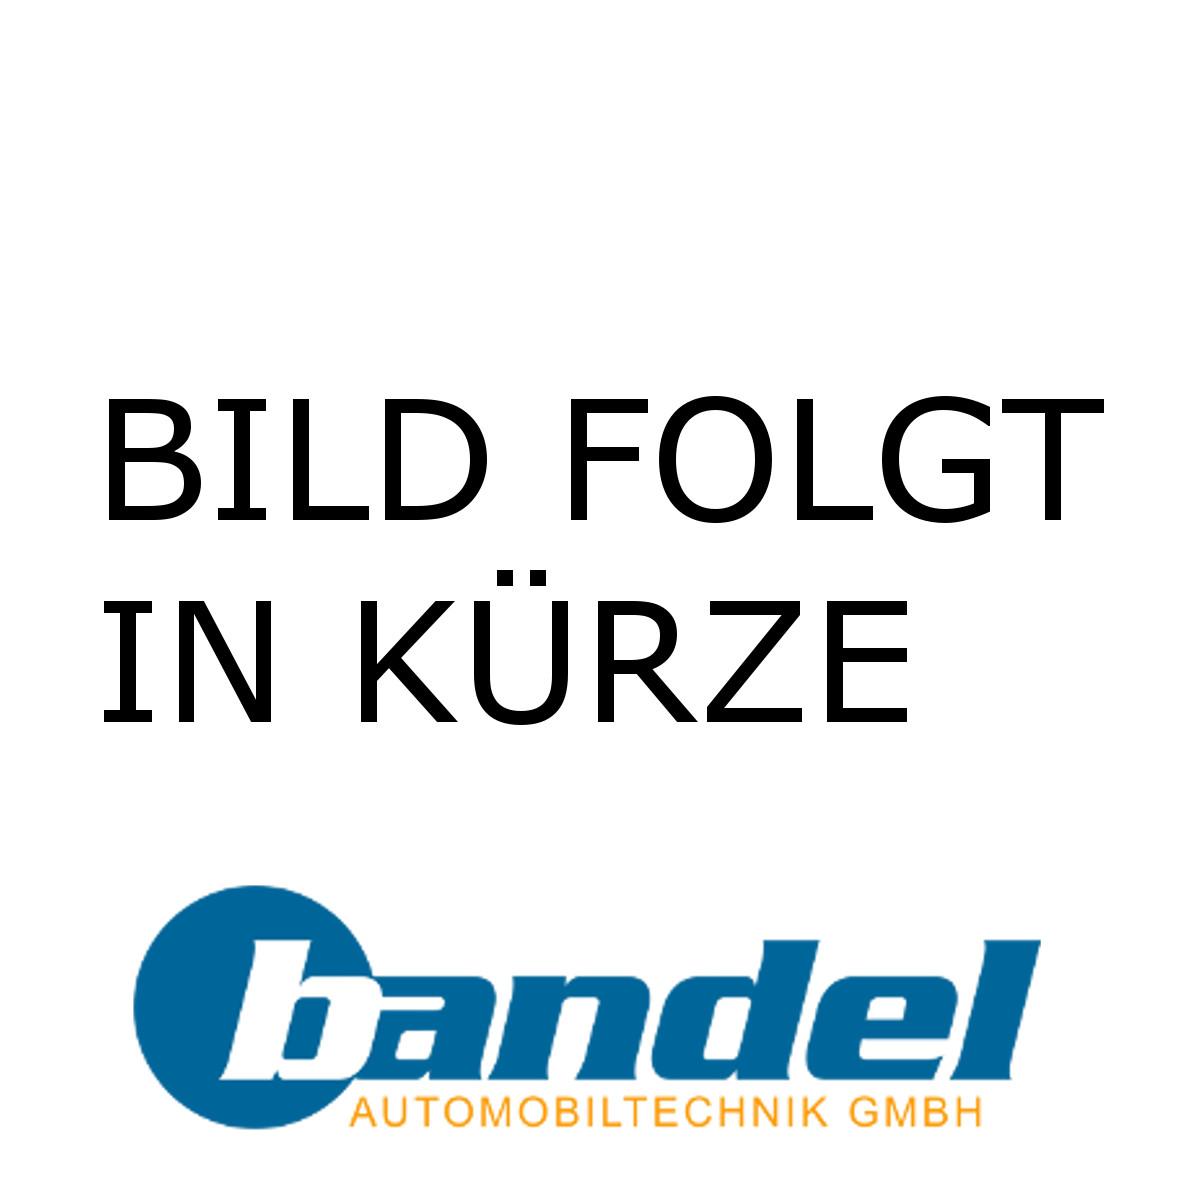 2x MEYLE GASDRUCK STOßDÄMPFER VORDERACHSE AUDI A6 (C6) + AVANT Pic:3